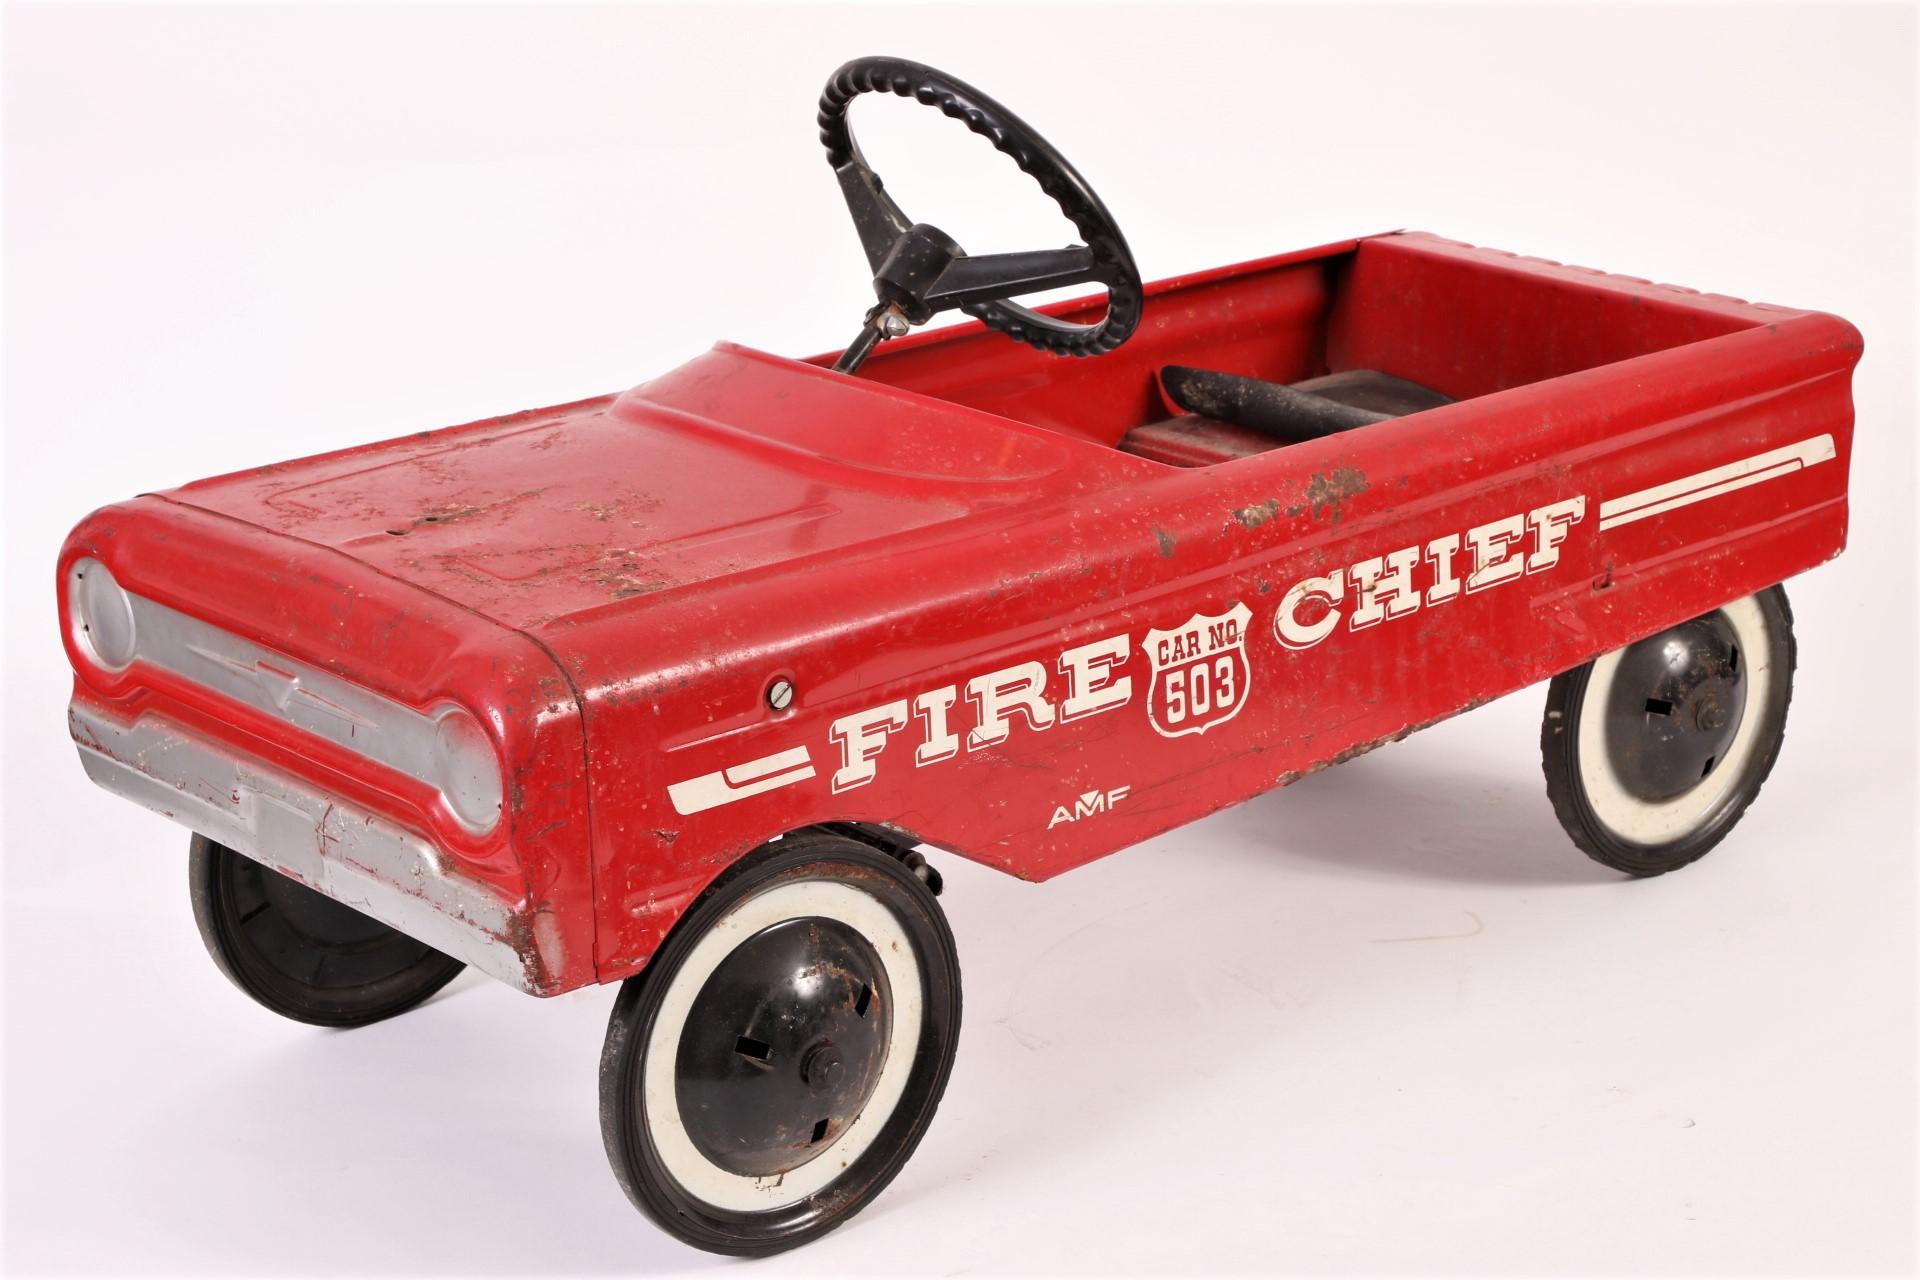 Vintage Amf Fire Chief Pedal Car Circa 1970 S 62575 Black Rock Galleries